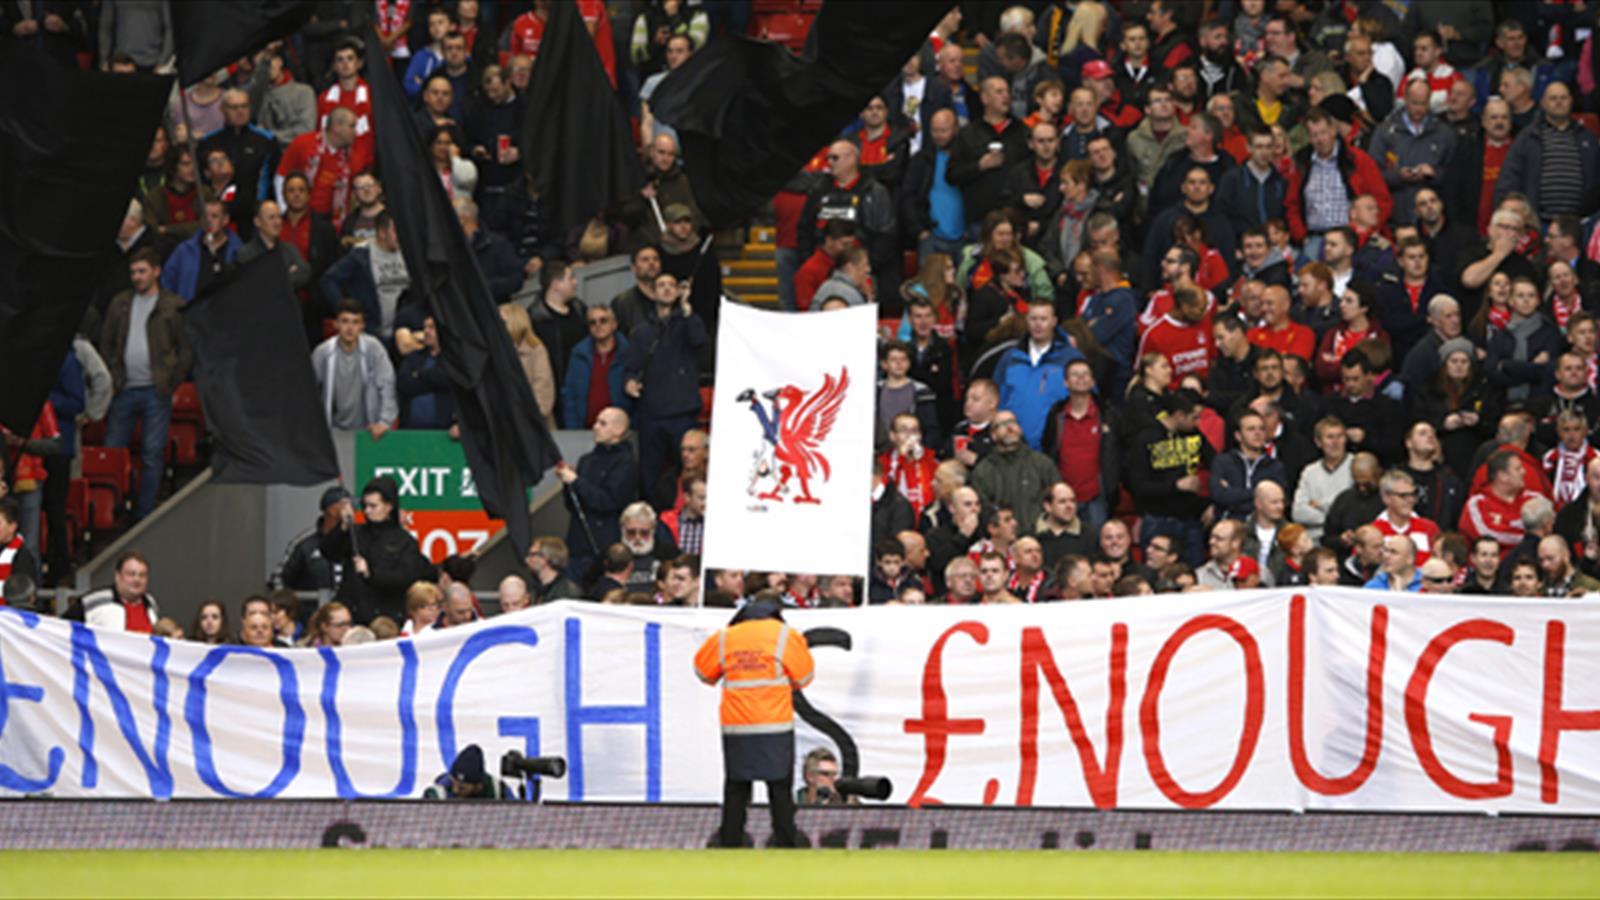 Premier League boss Scudamore predicts record crowds, claims tickets cheap - Premier League 2015 ...